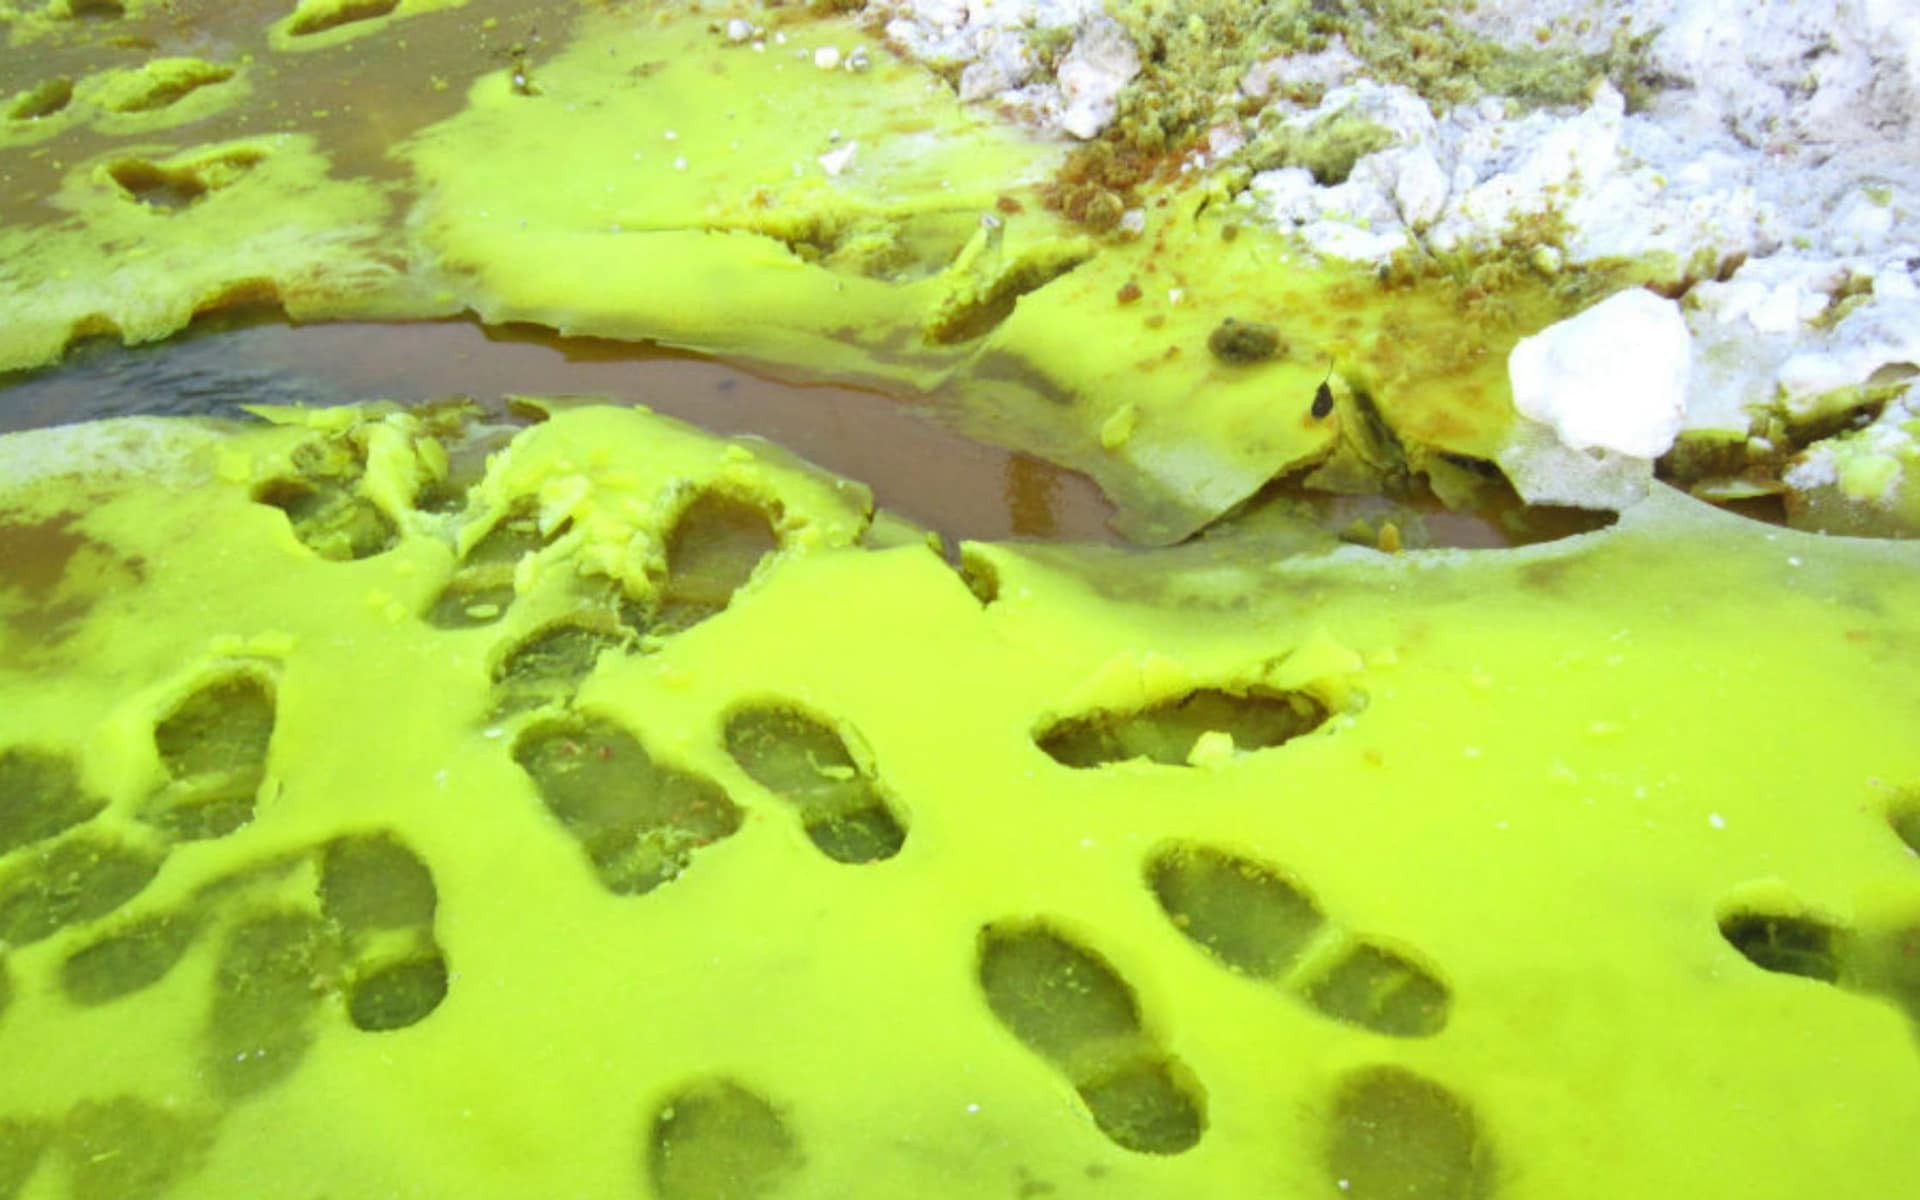 cierny zeleny sneh rusko zivotne prostredie tovaren chrom uhlie znecistenie